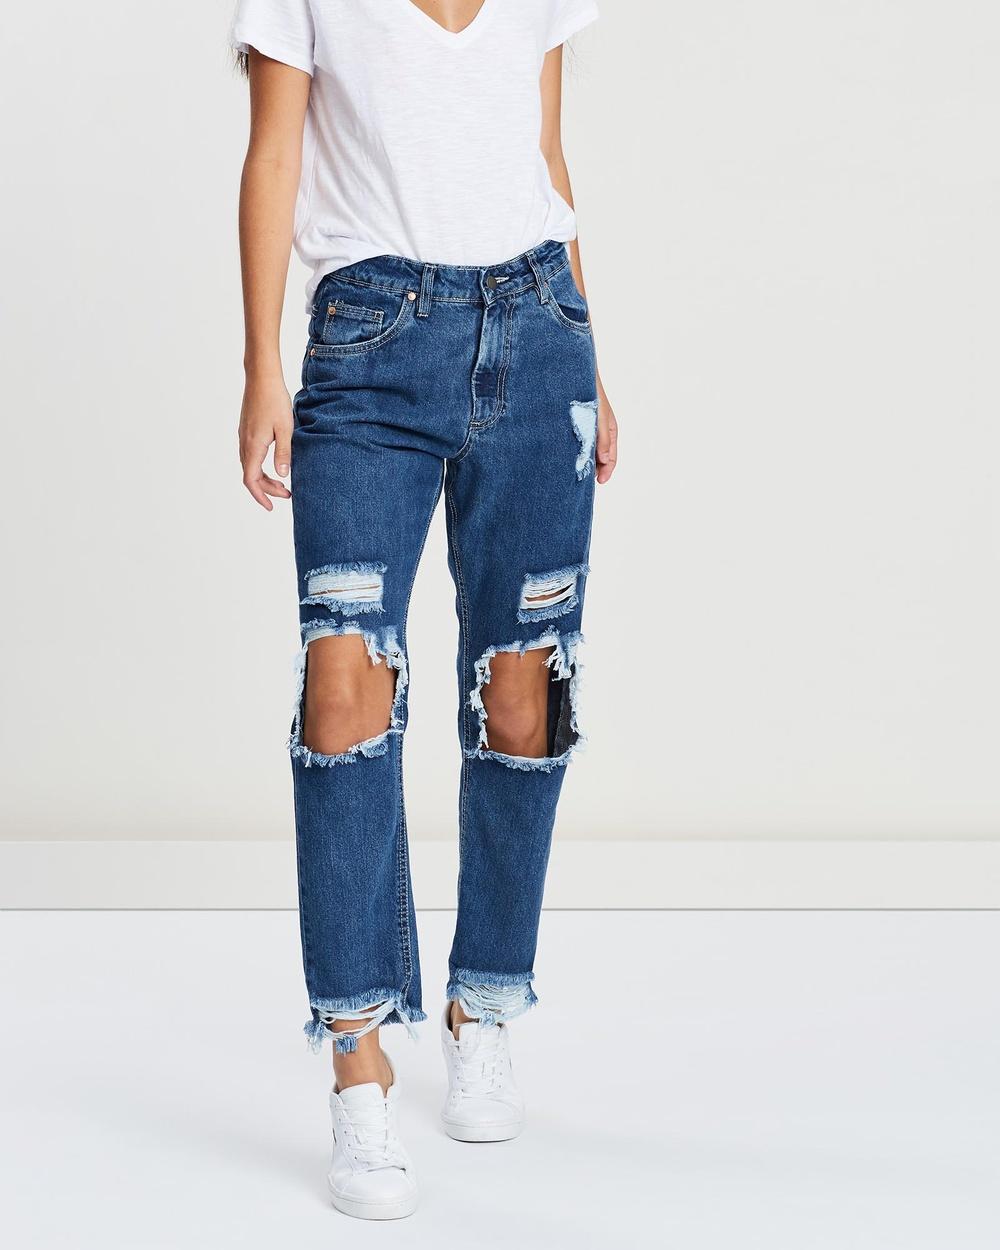 DRICOPER DENIM Mom Jeans High-Waisted Mid Indigo Wash Australia